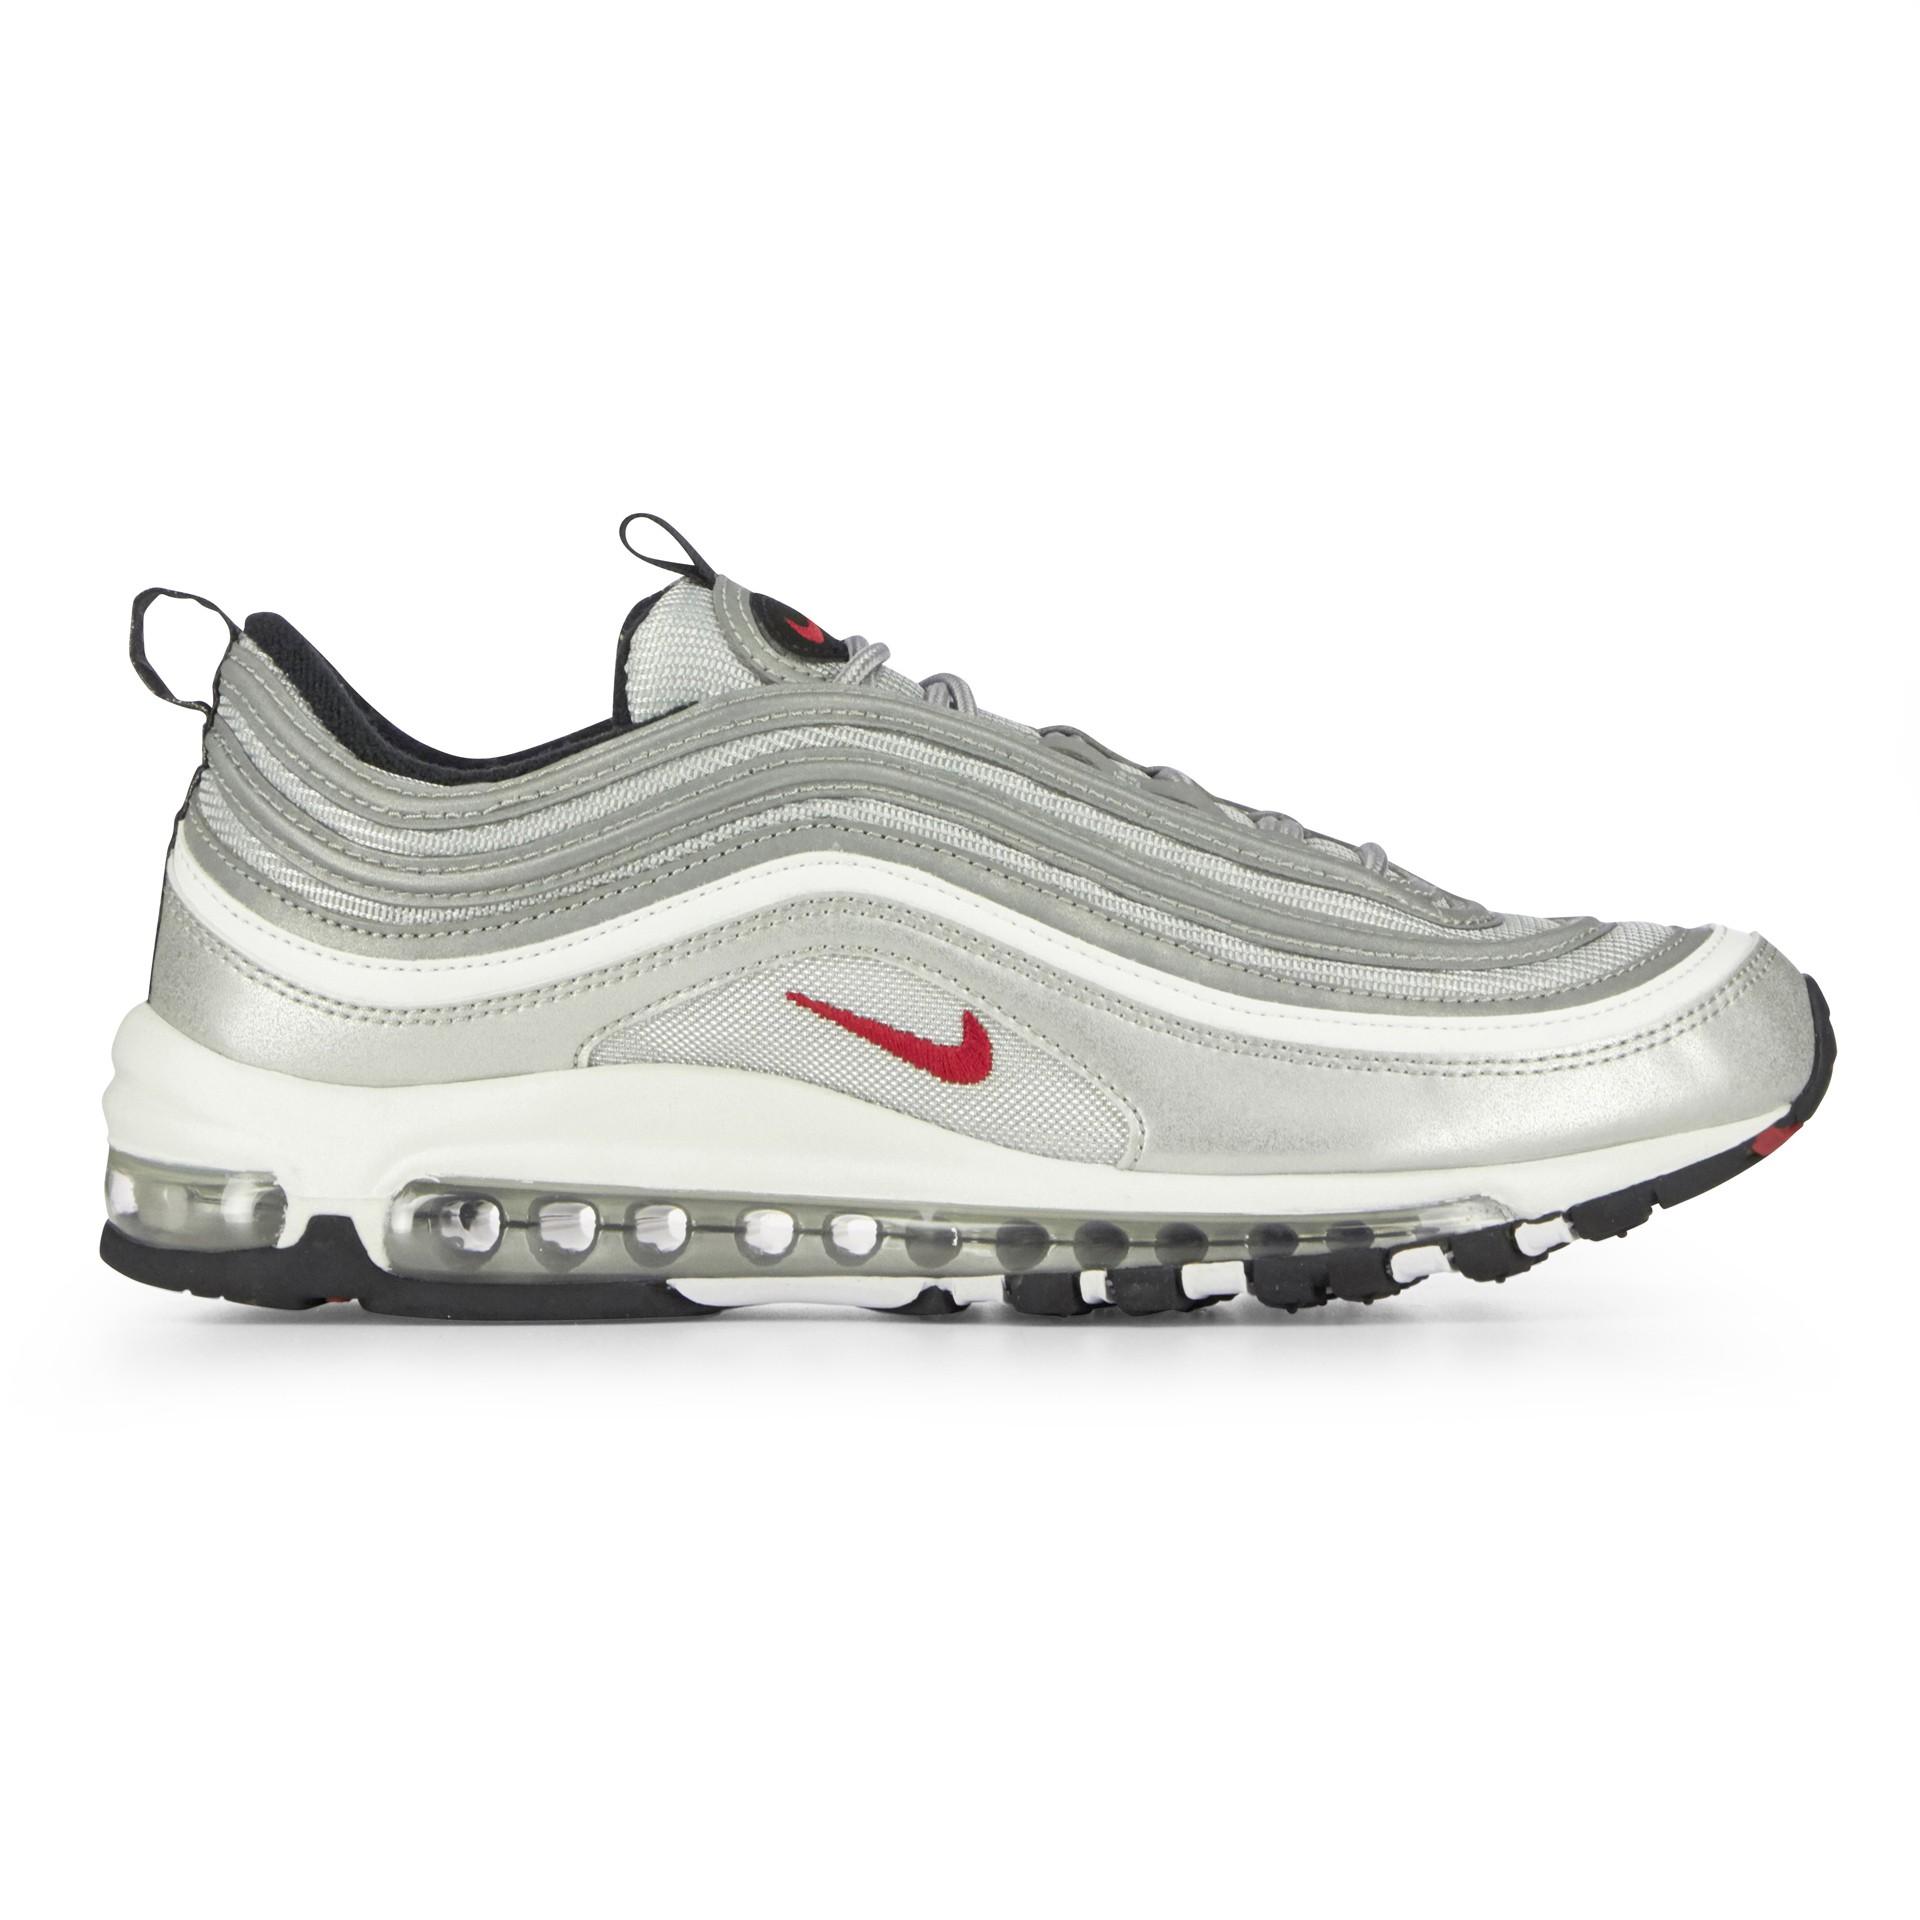 online store 4a646 79c05 Chaussure de training Nike Air Max 97 Cobblestone/Blanc 921826 002 ... chaussure  air max homme pas cher magasin soldes,nike air max 97 noir,nike basket